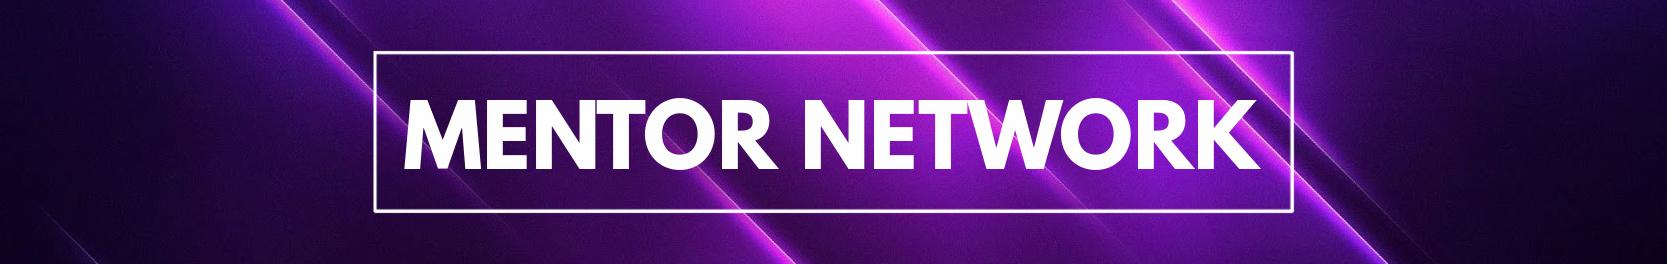 mentor-network